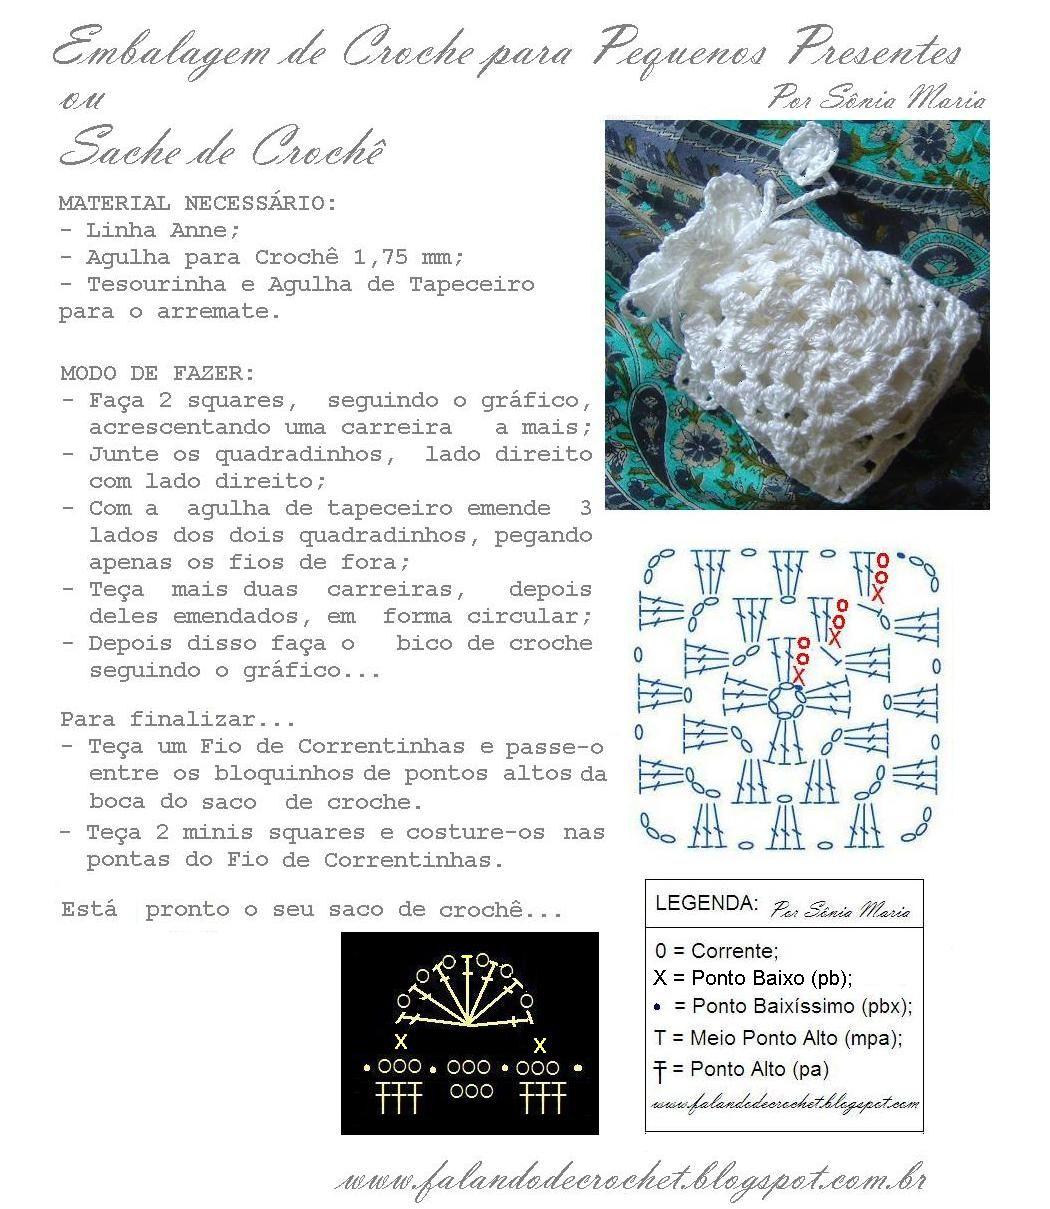 Pin von lolita maceira auf Projetos para experimentar | Pinterest ...